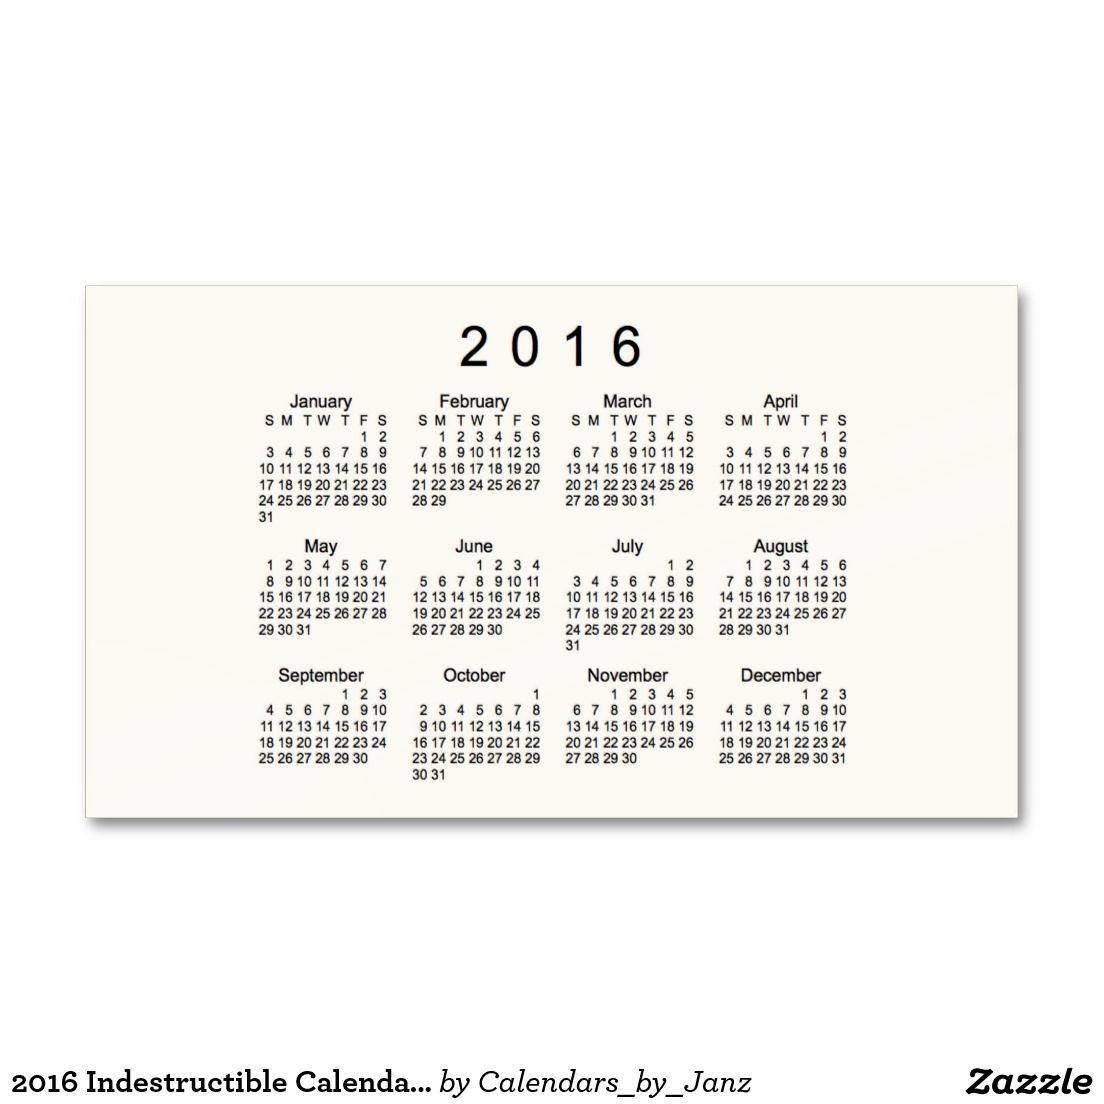 2016 indestructible calendar by janz business card - Shell Small Business Card